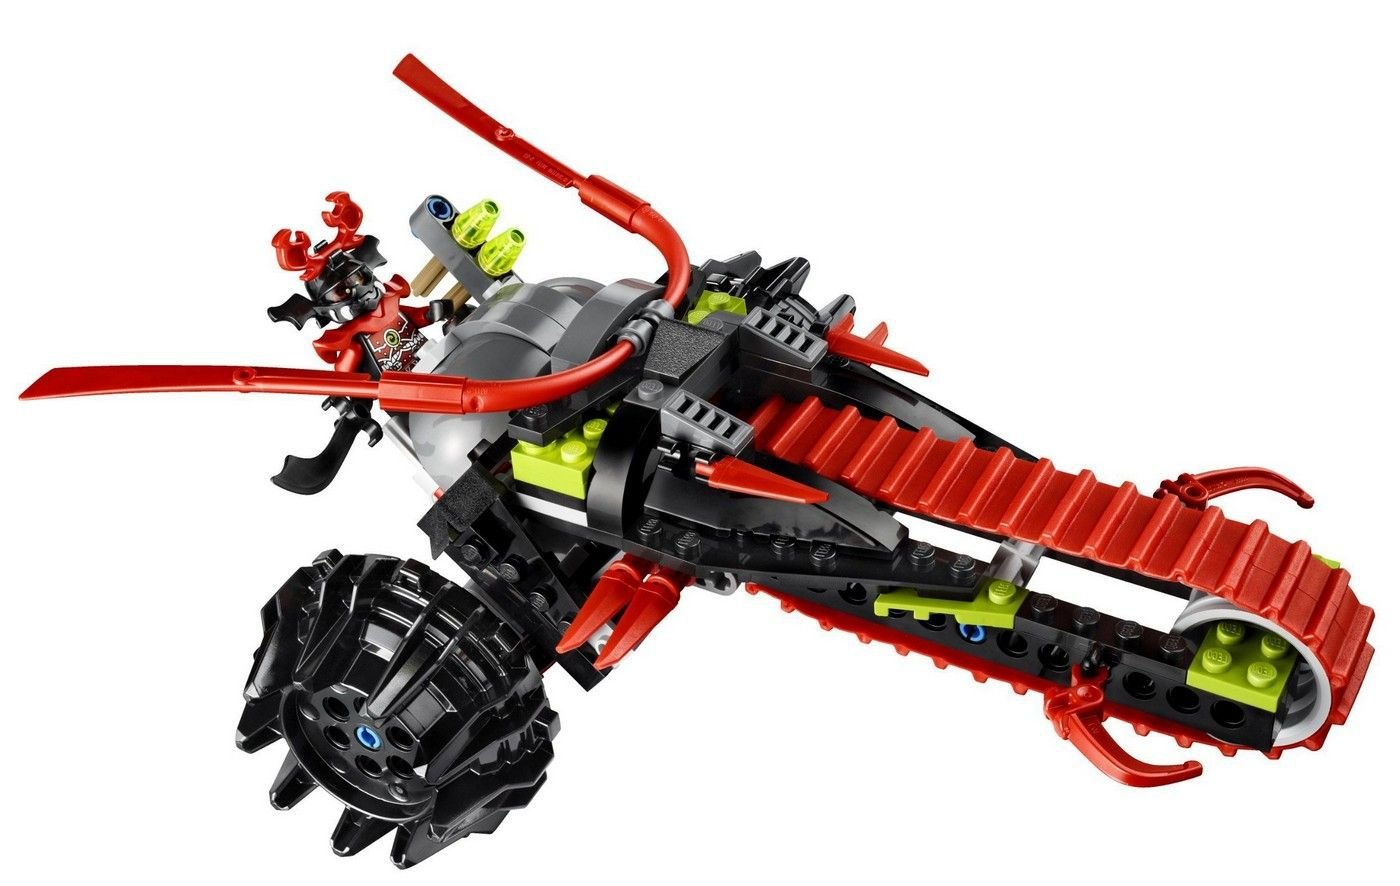 Lego ninjago купить алматы